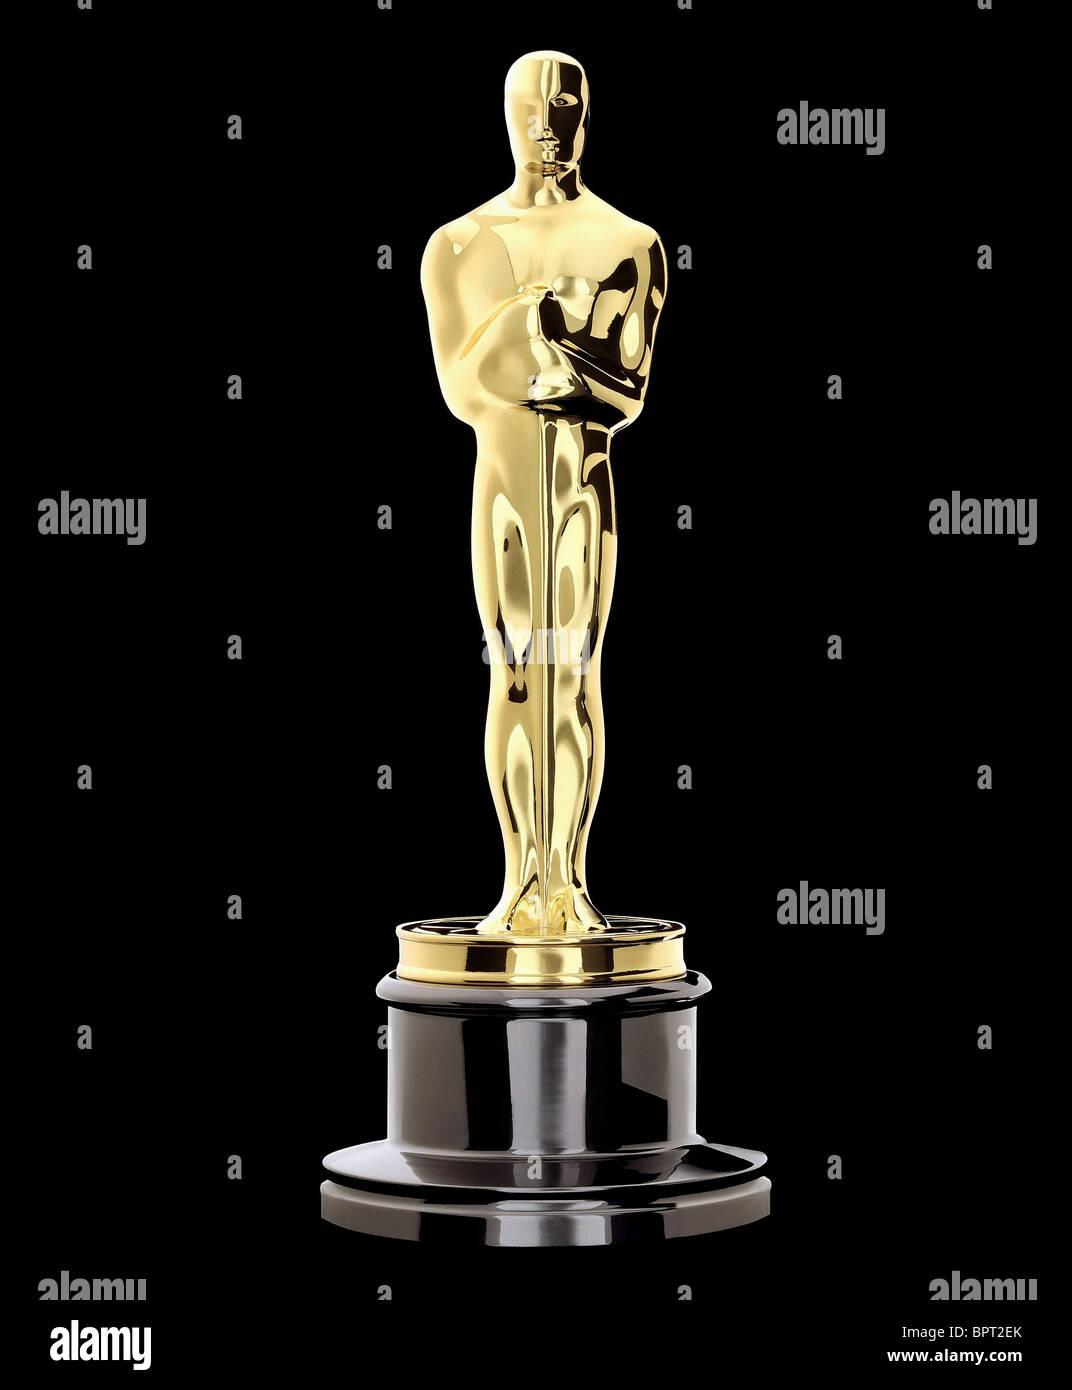 ACADEMY AWARDS OSCAR STATUETTE ACADEMY AWARDS OSCAR STATUETTE (2007) - Stock Image